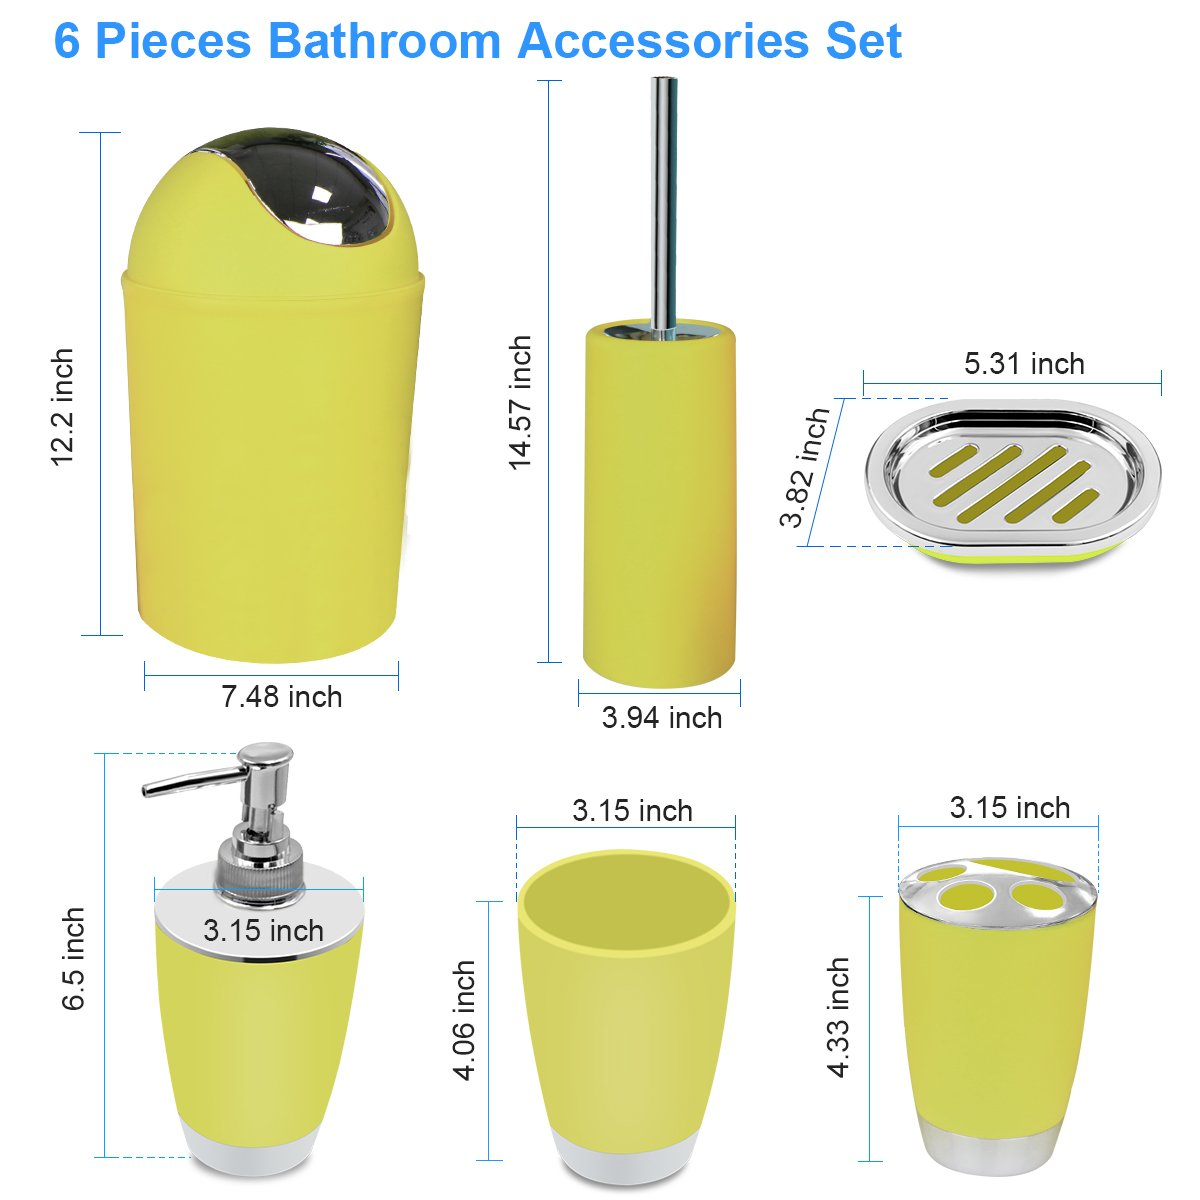 Amazon.com: Yellow Bathroom Accessories Set 6 Pieces Plastic ...